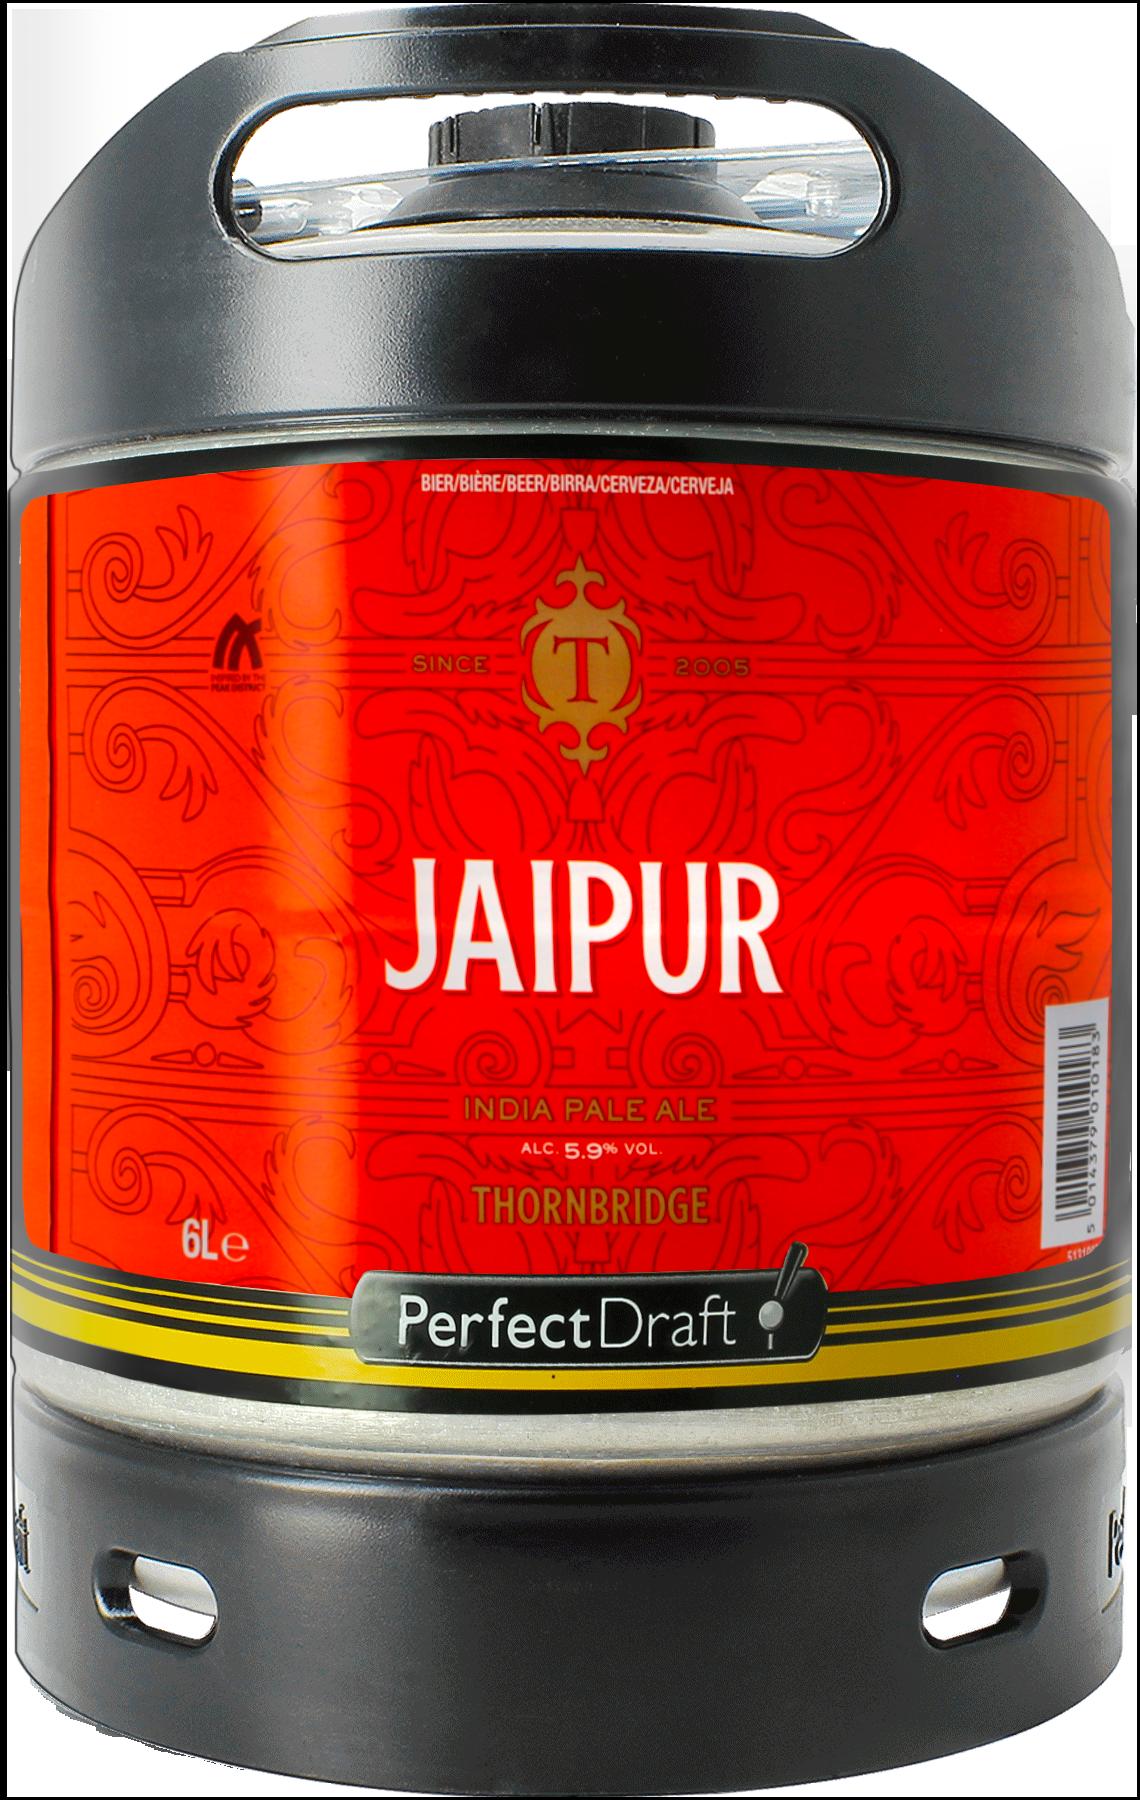 Barril Thornbridge Jaipur PerfectDraft 6 L